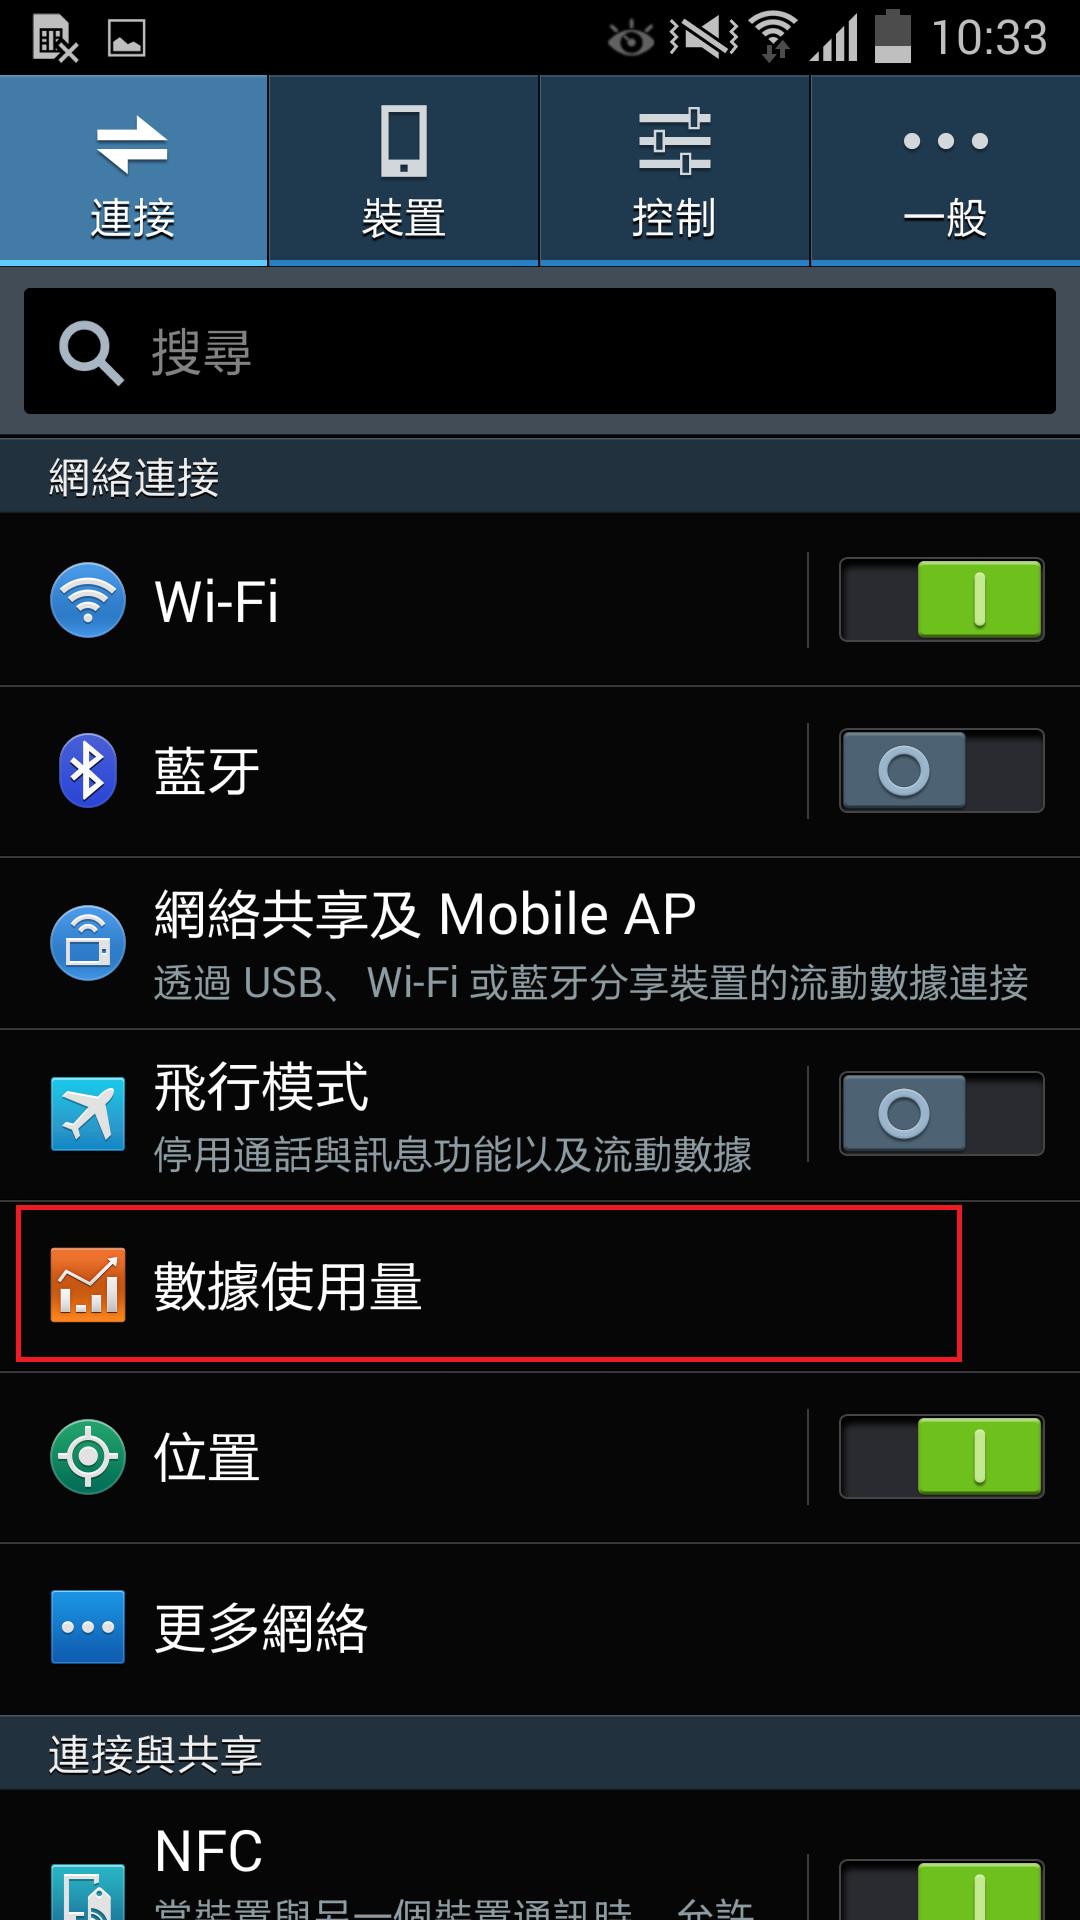 為何升級到Android 4.4.2後不能同步電子郵件?